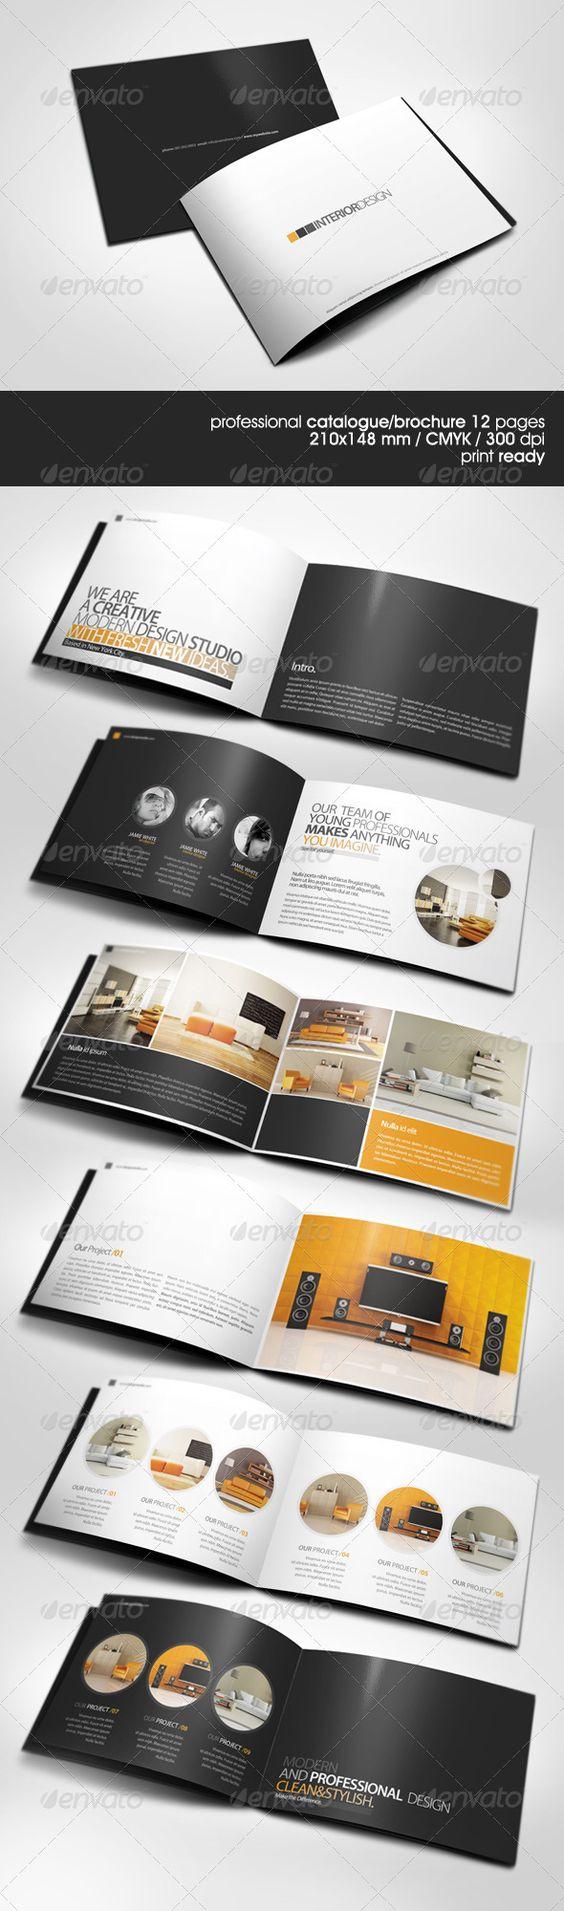 interior design brochure - Brochures, Layout and Modern on Pinterest